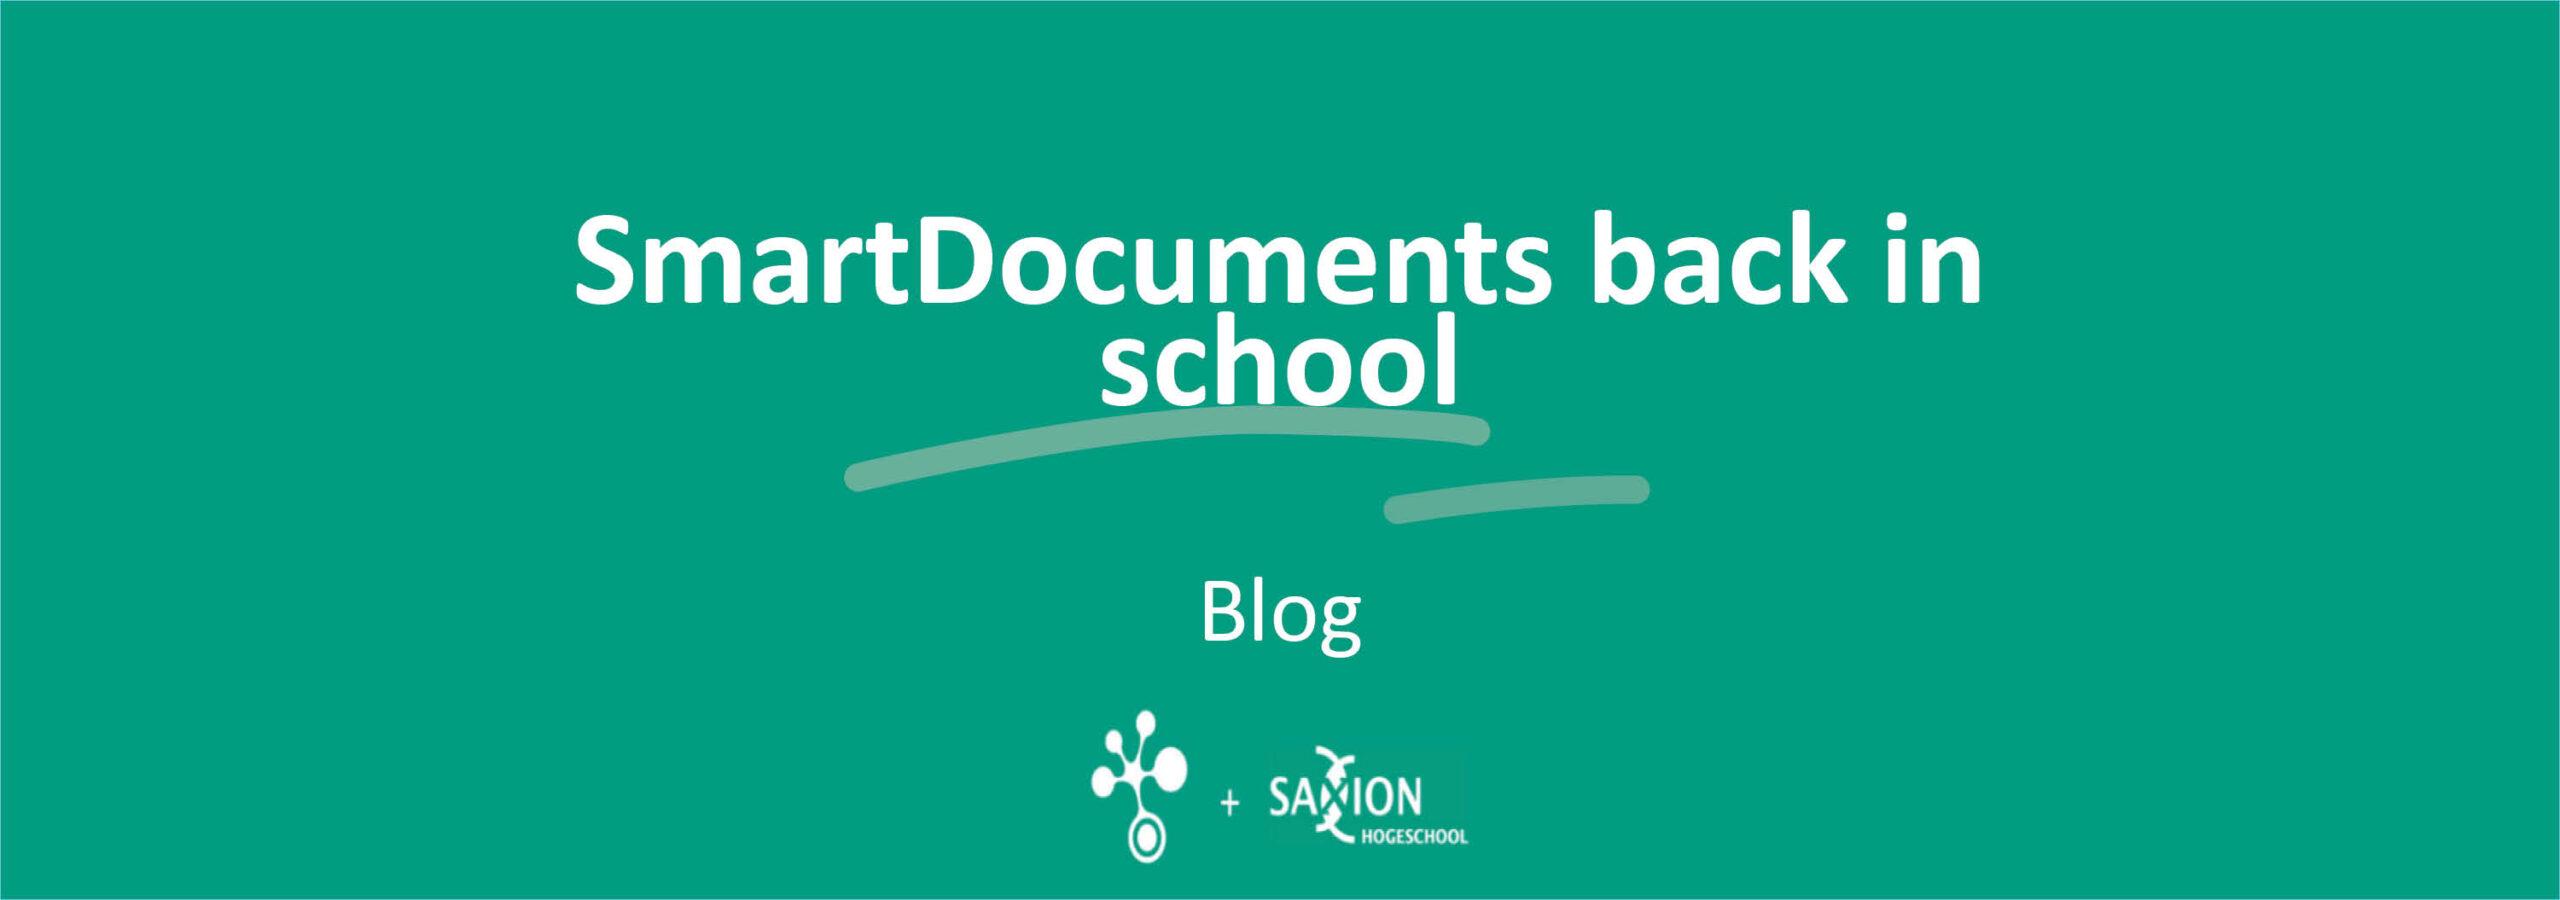 SmartDocuments back in school